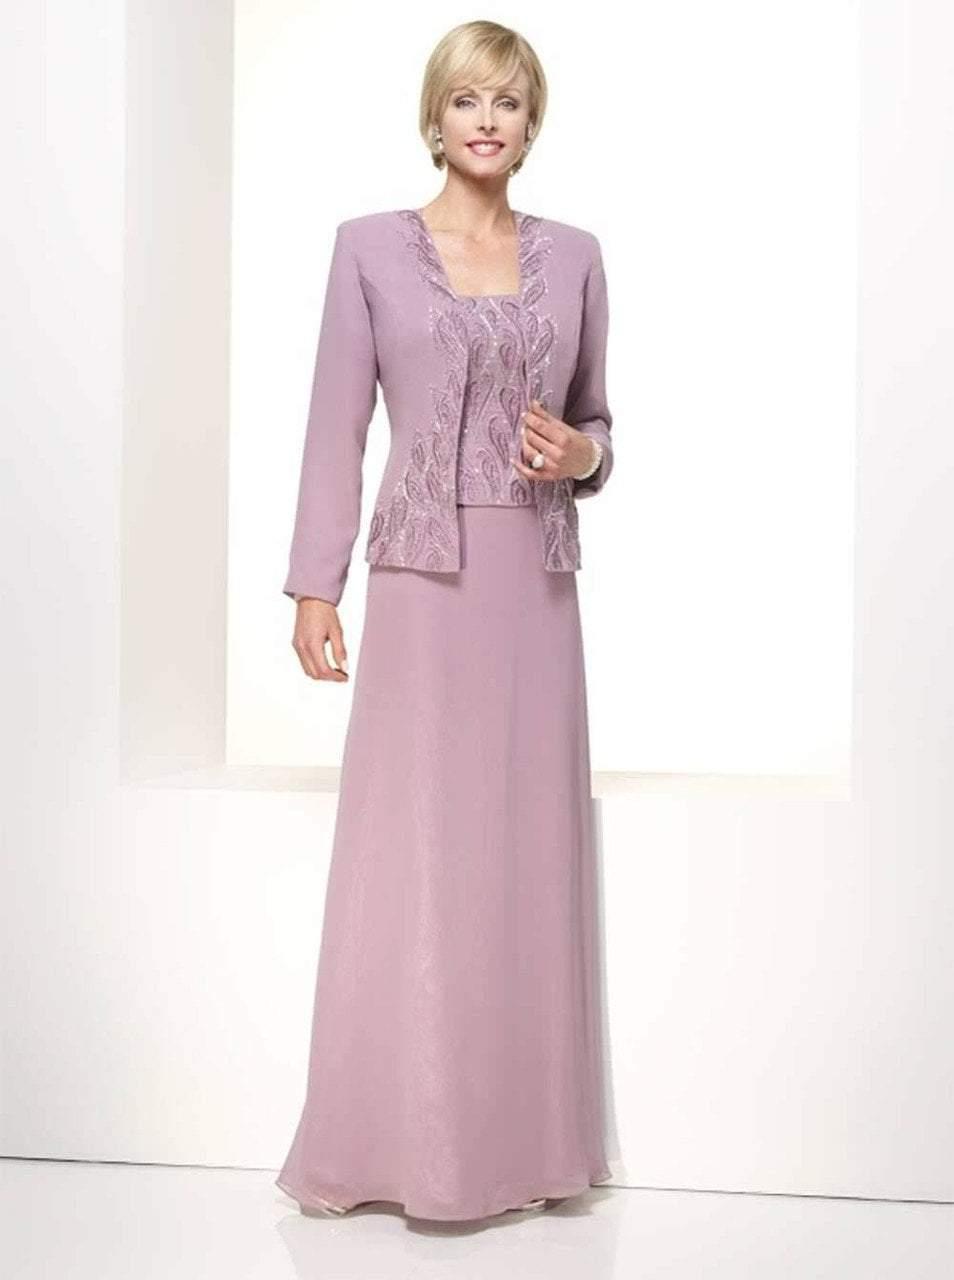 Alyce Paris - 29953 Long Dress In Peach